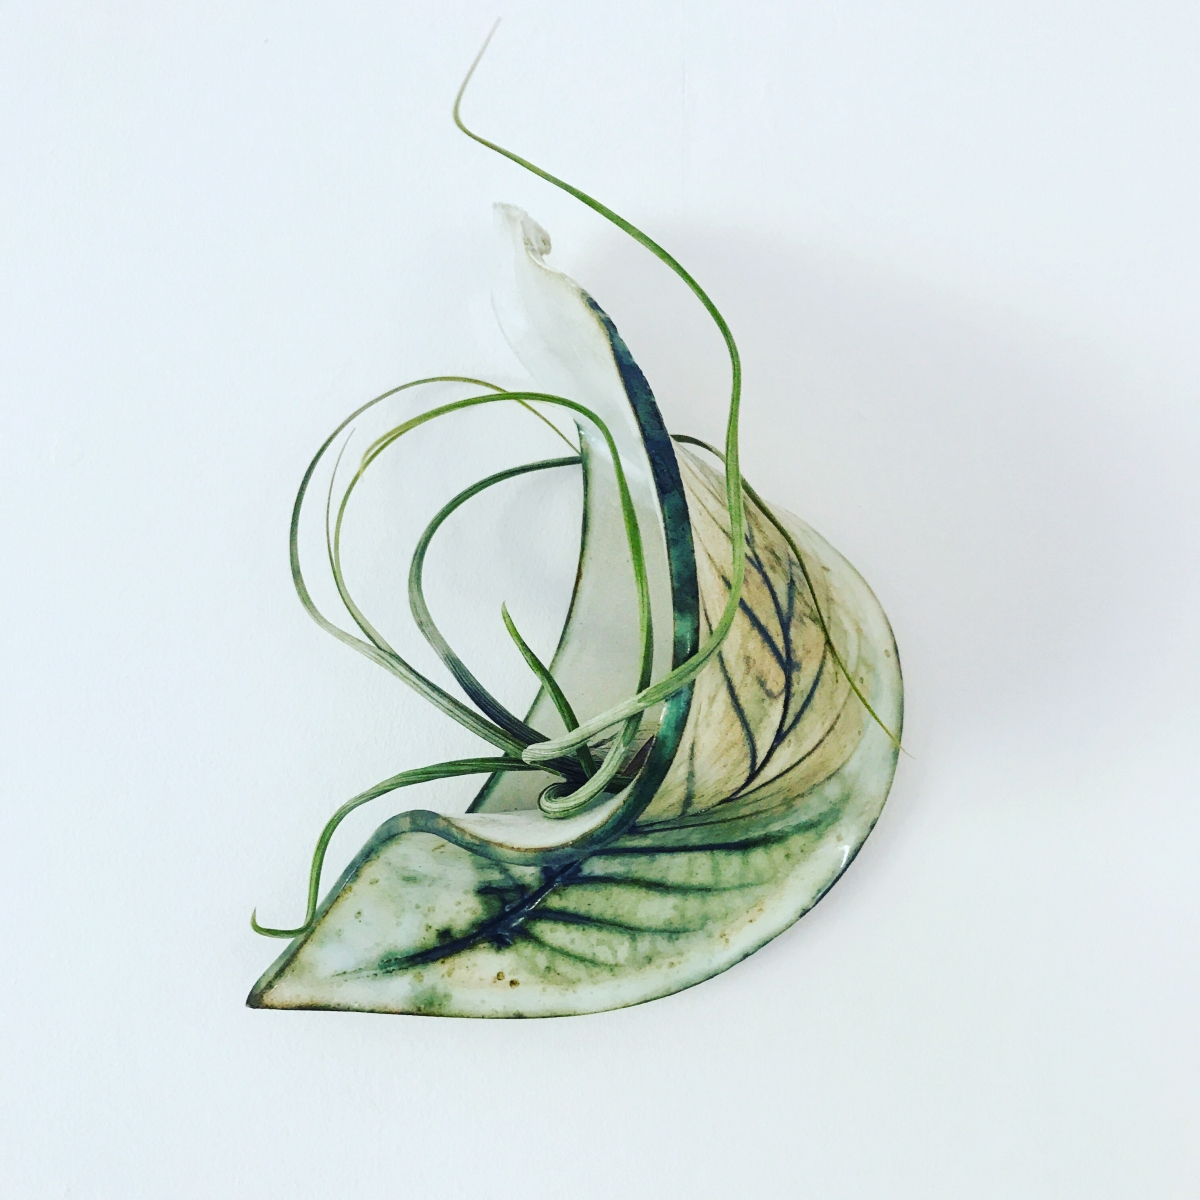 Ceramic Wall Art Planters for Air Plants by Sonya Ceramic Art